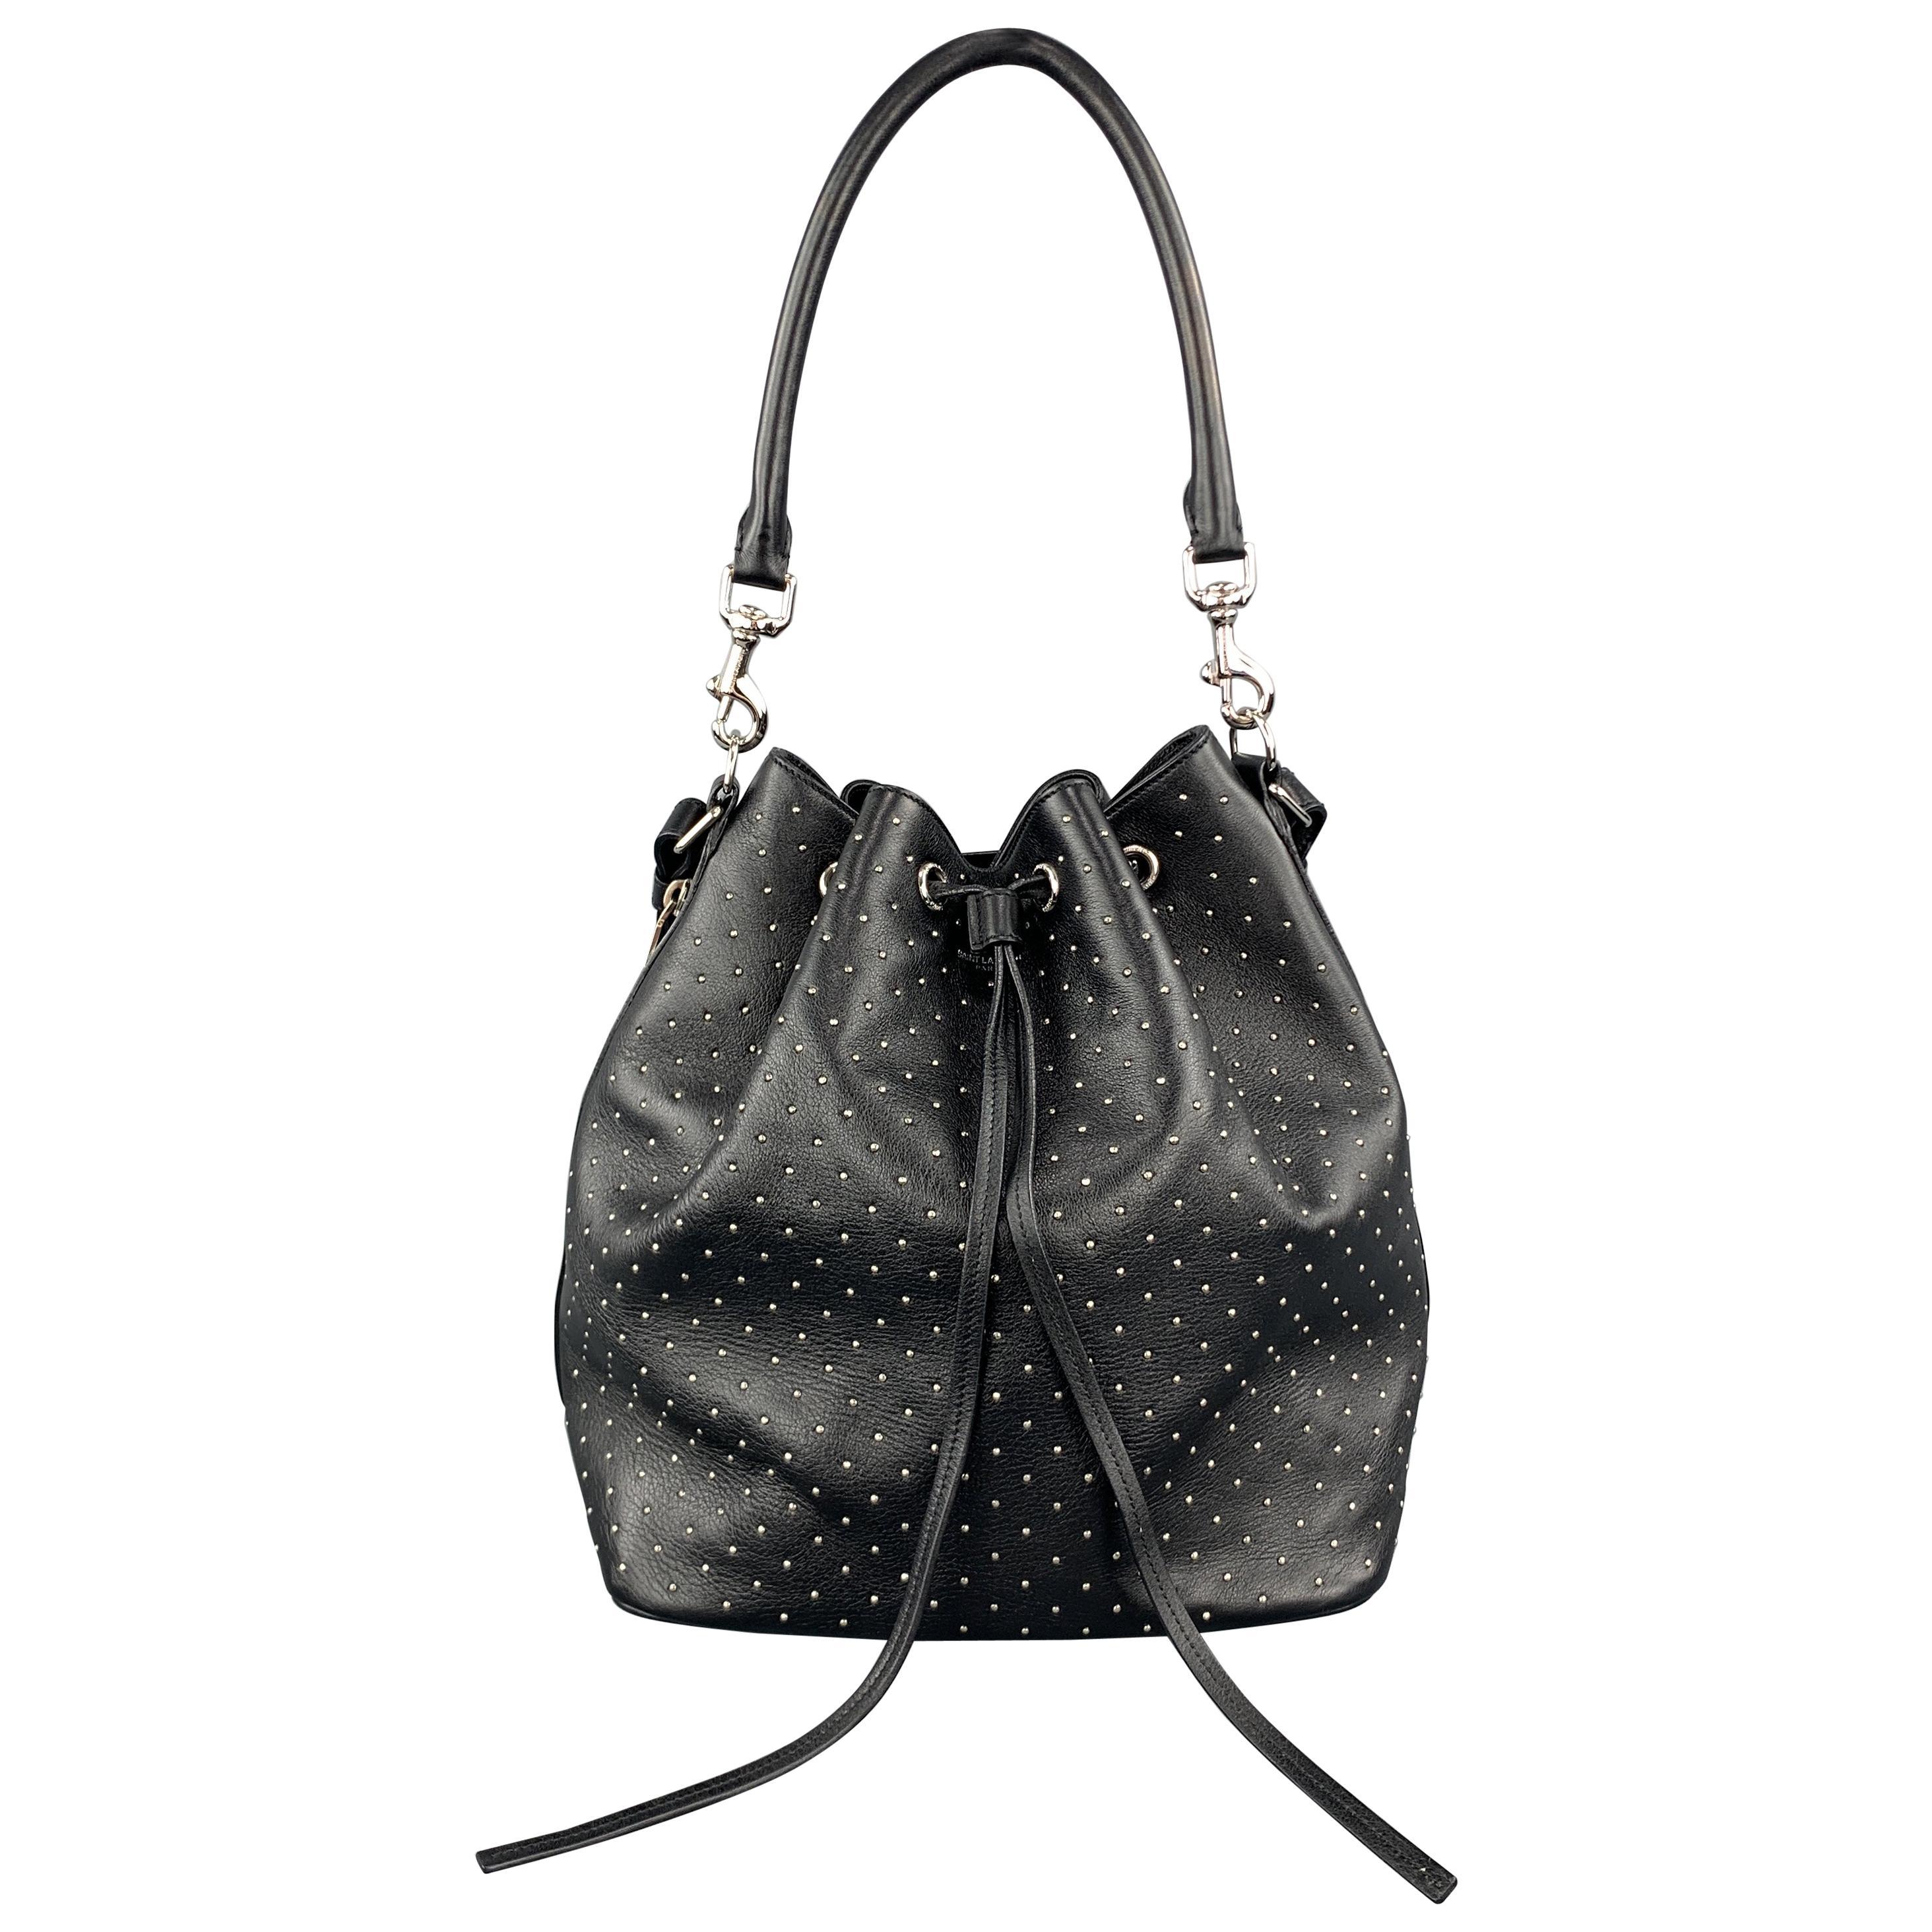 SAINT LAURENT Studded Black Leather Emmanuelle Bucket Bag